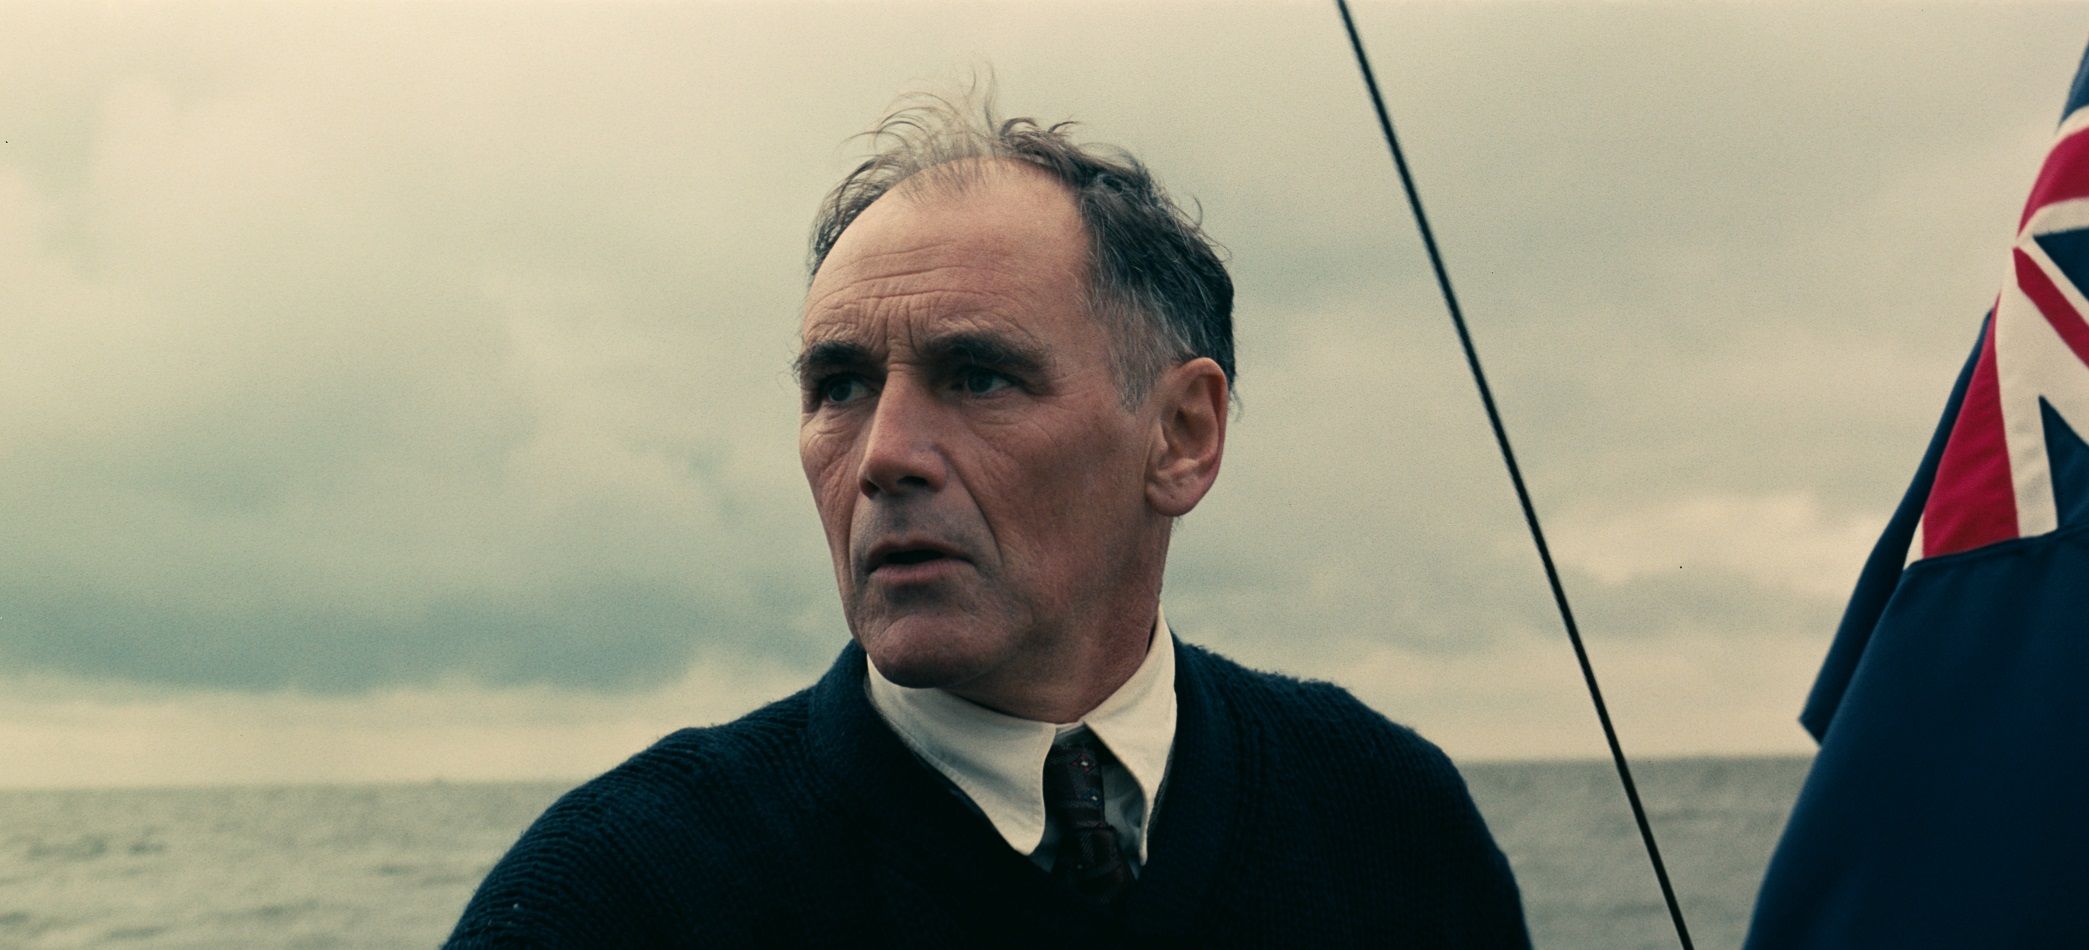 Dunkirk' Cast: Where You've Seen Christopher Nolan's